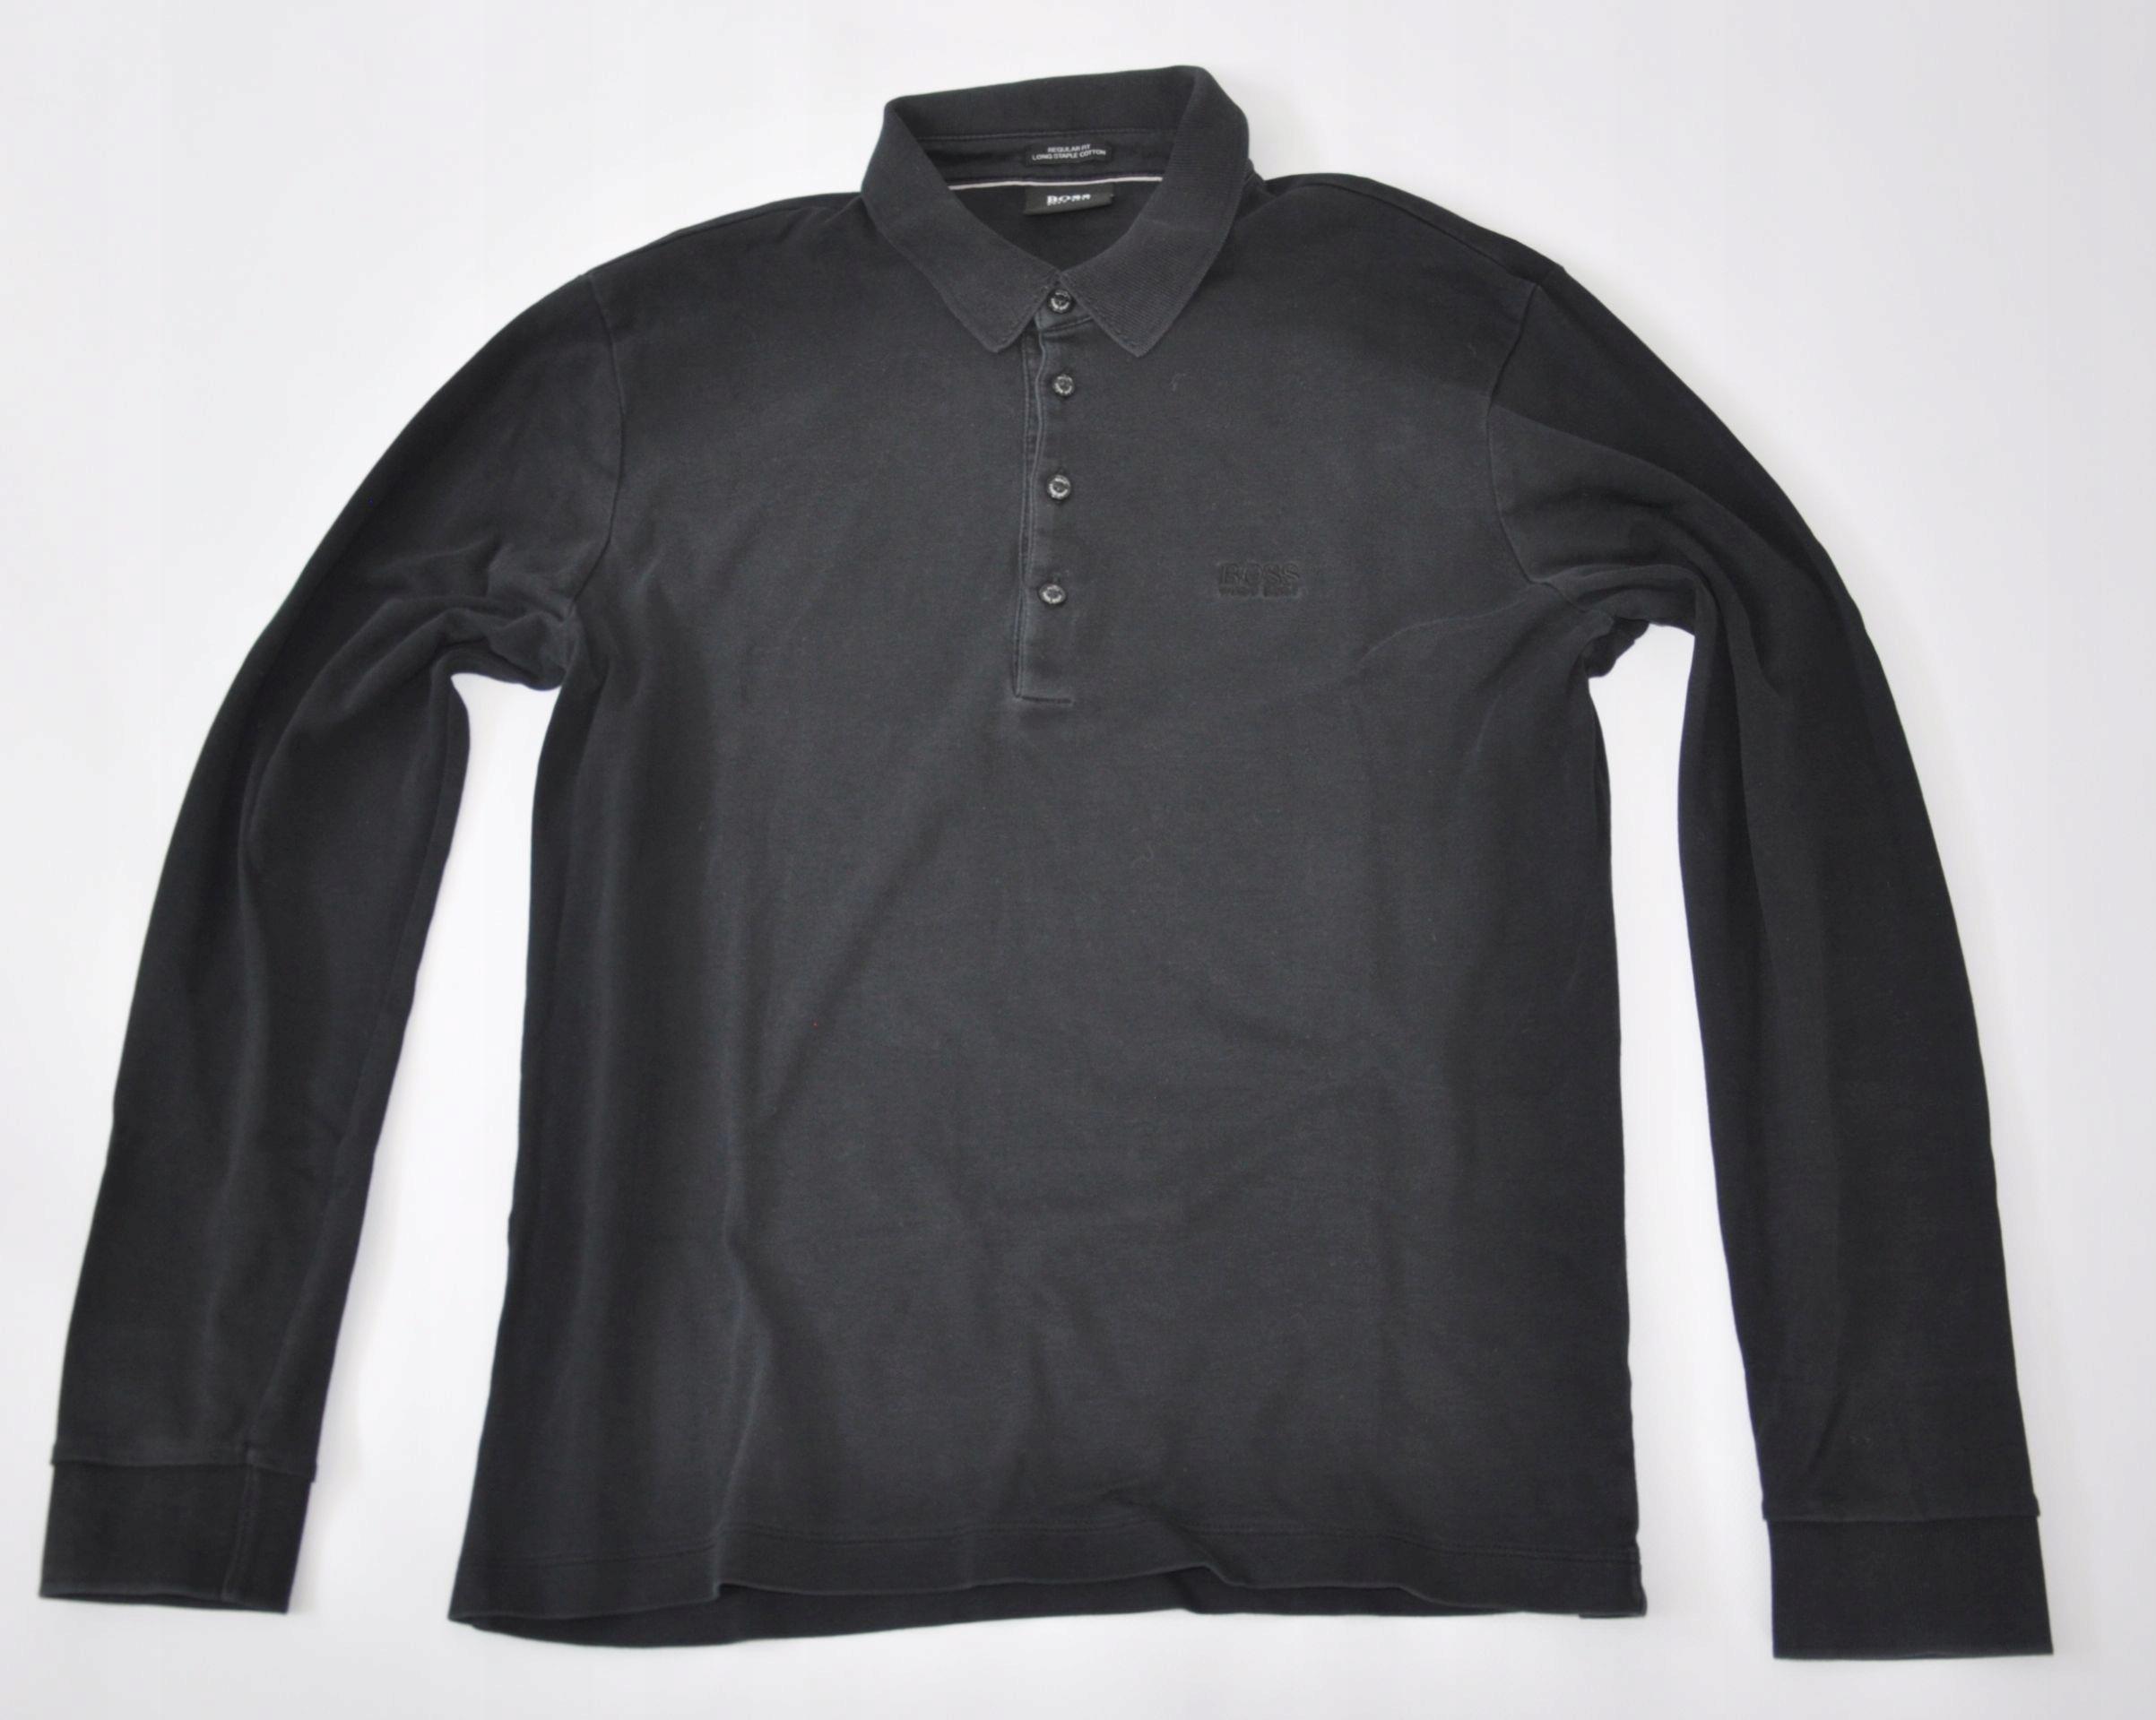 HUGO BOSS koszulka polówka bluzka czarna M